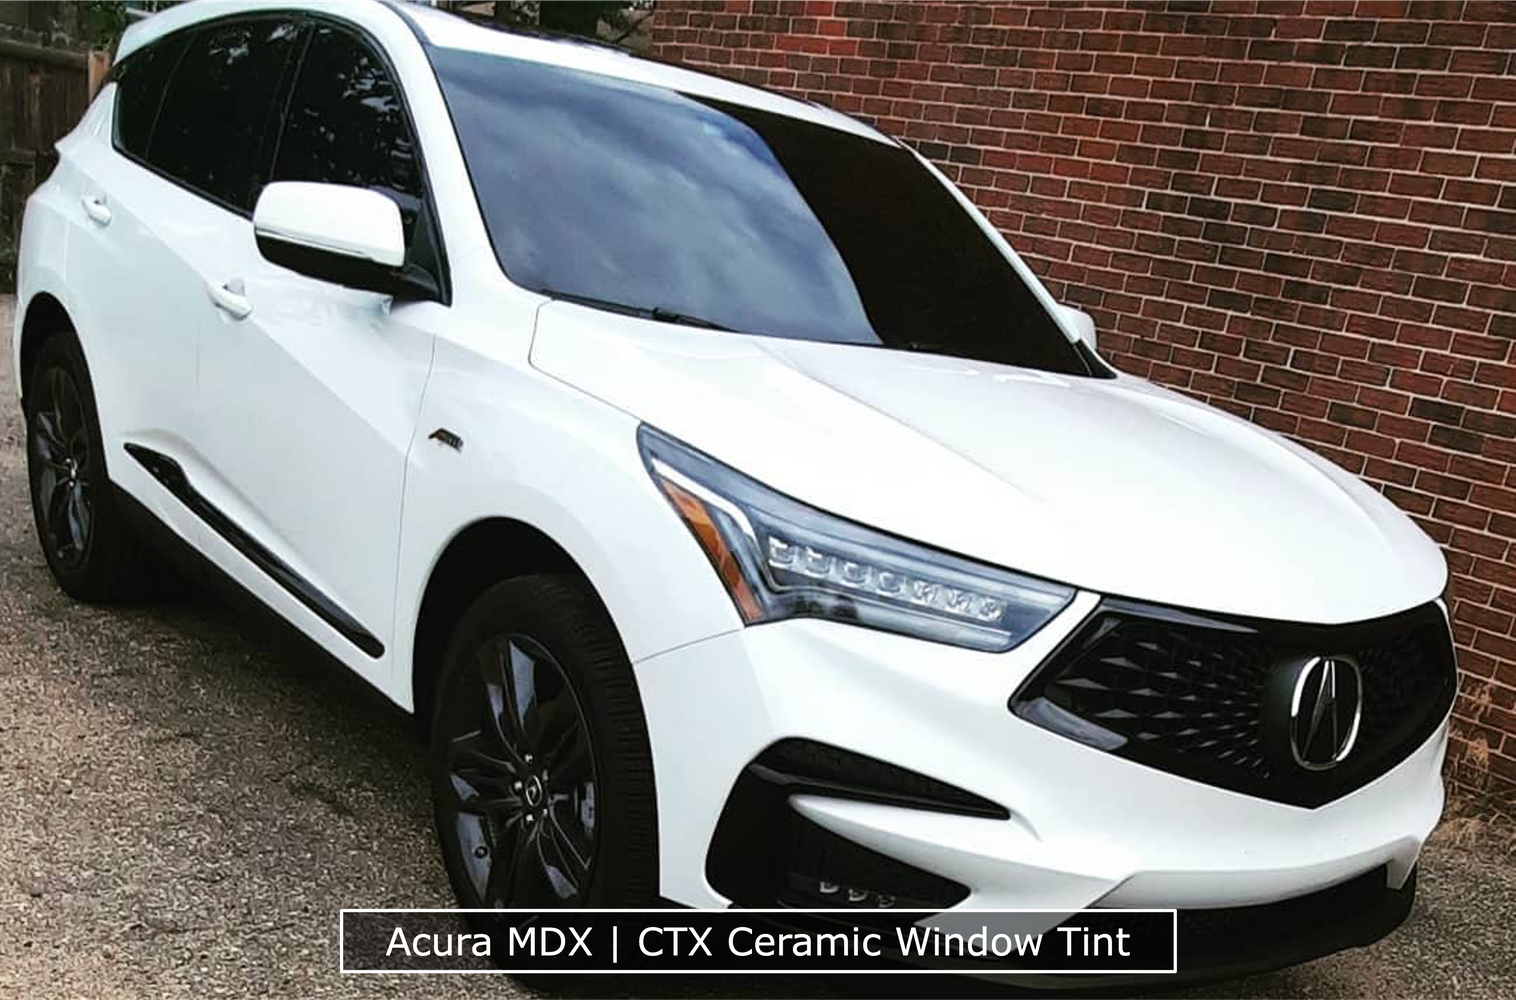 Acura MDX Ceramic Window Tint.png